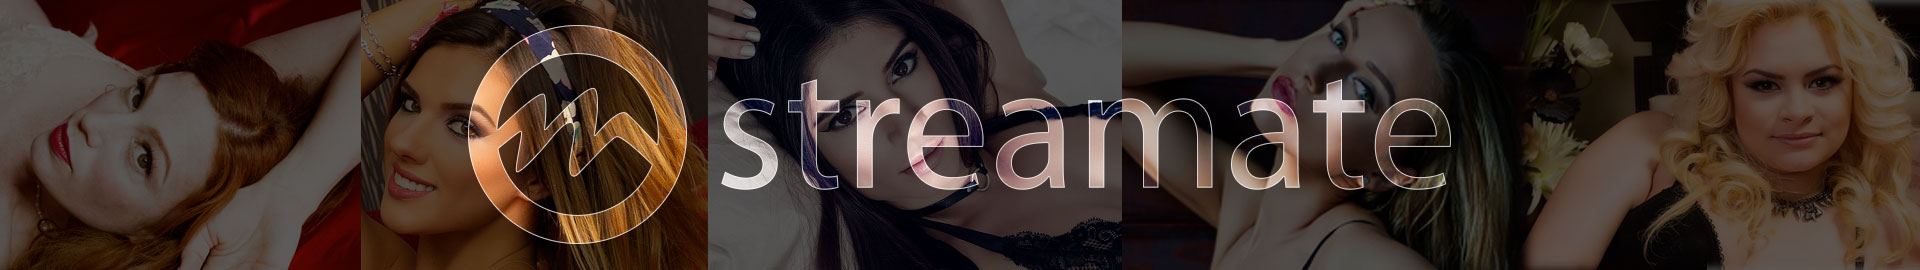 Streamate Models